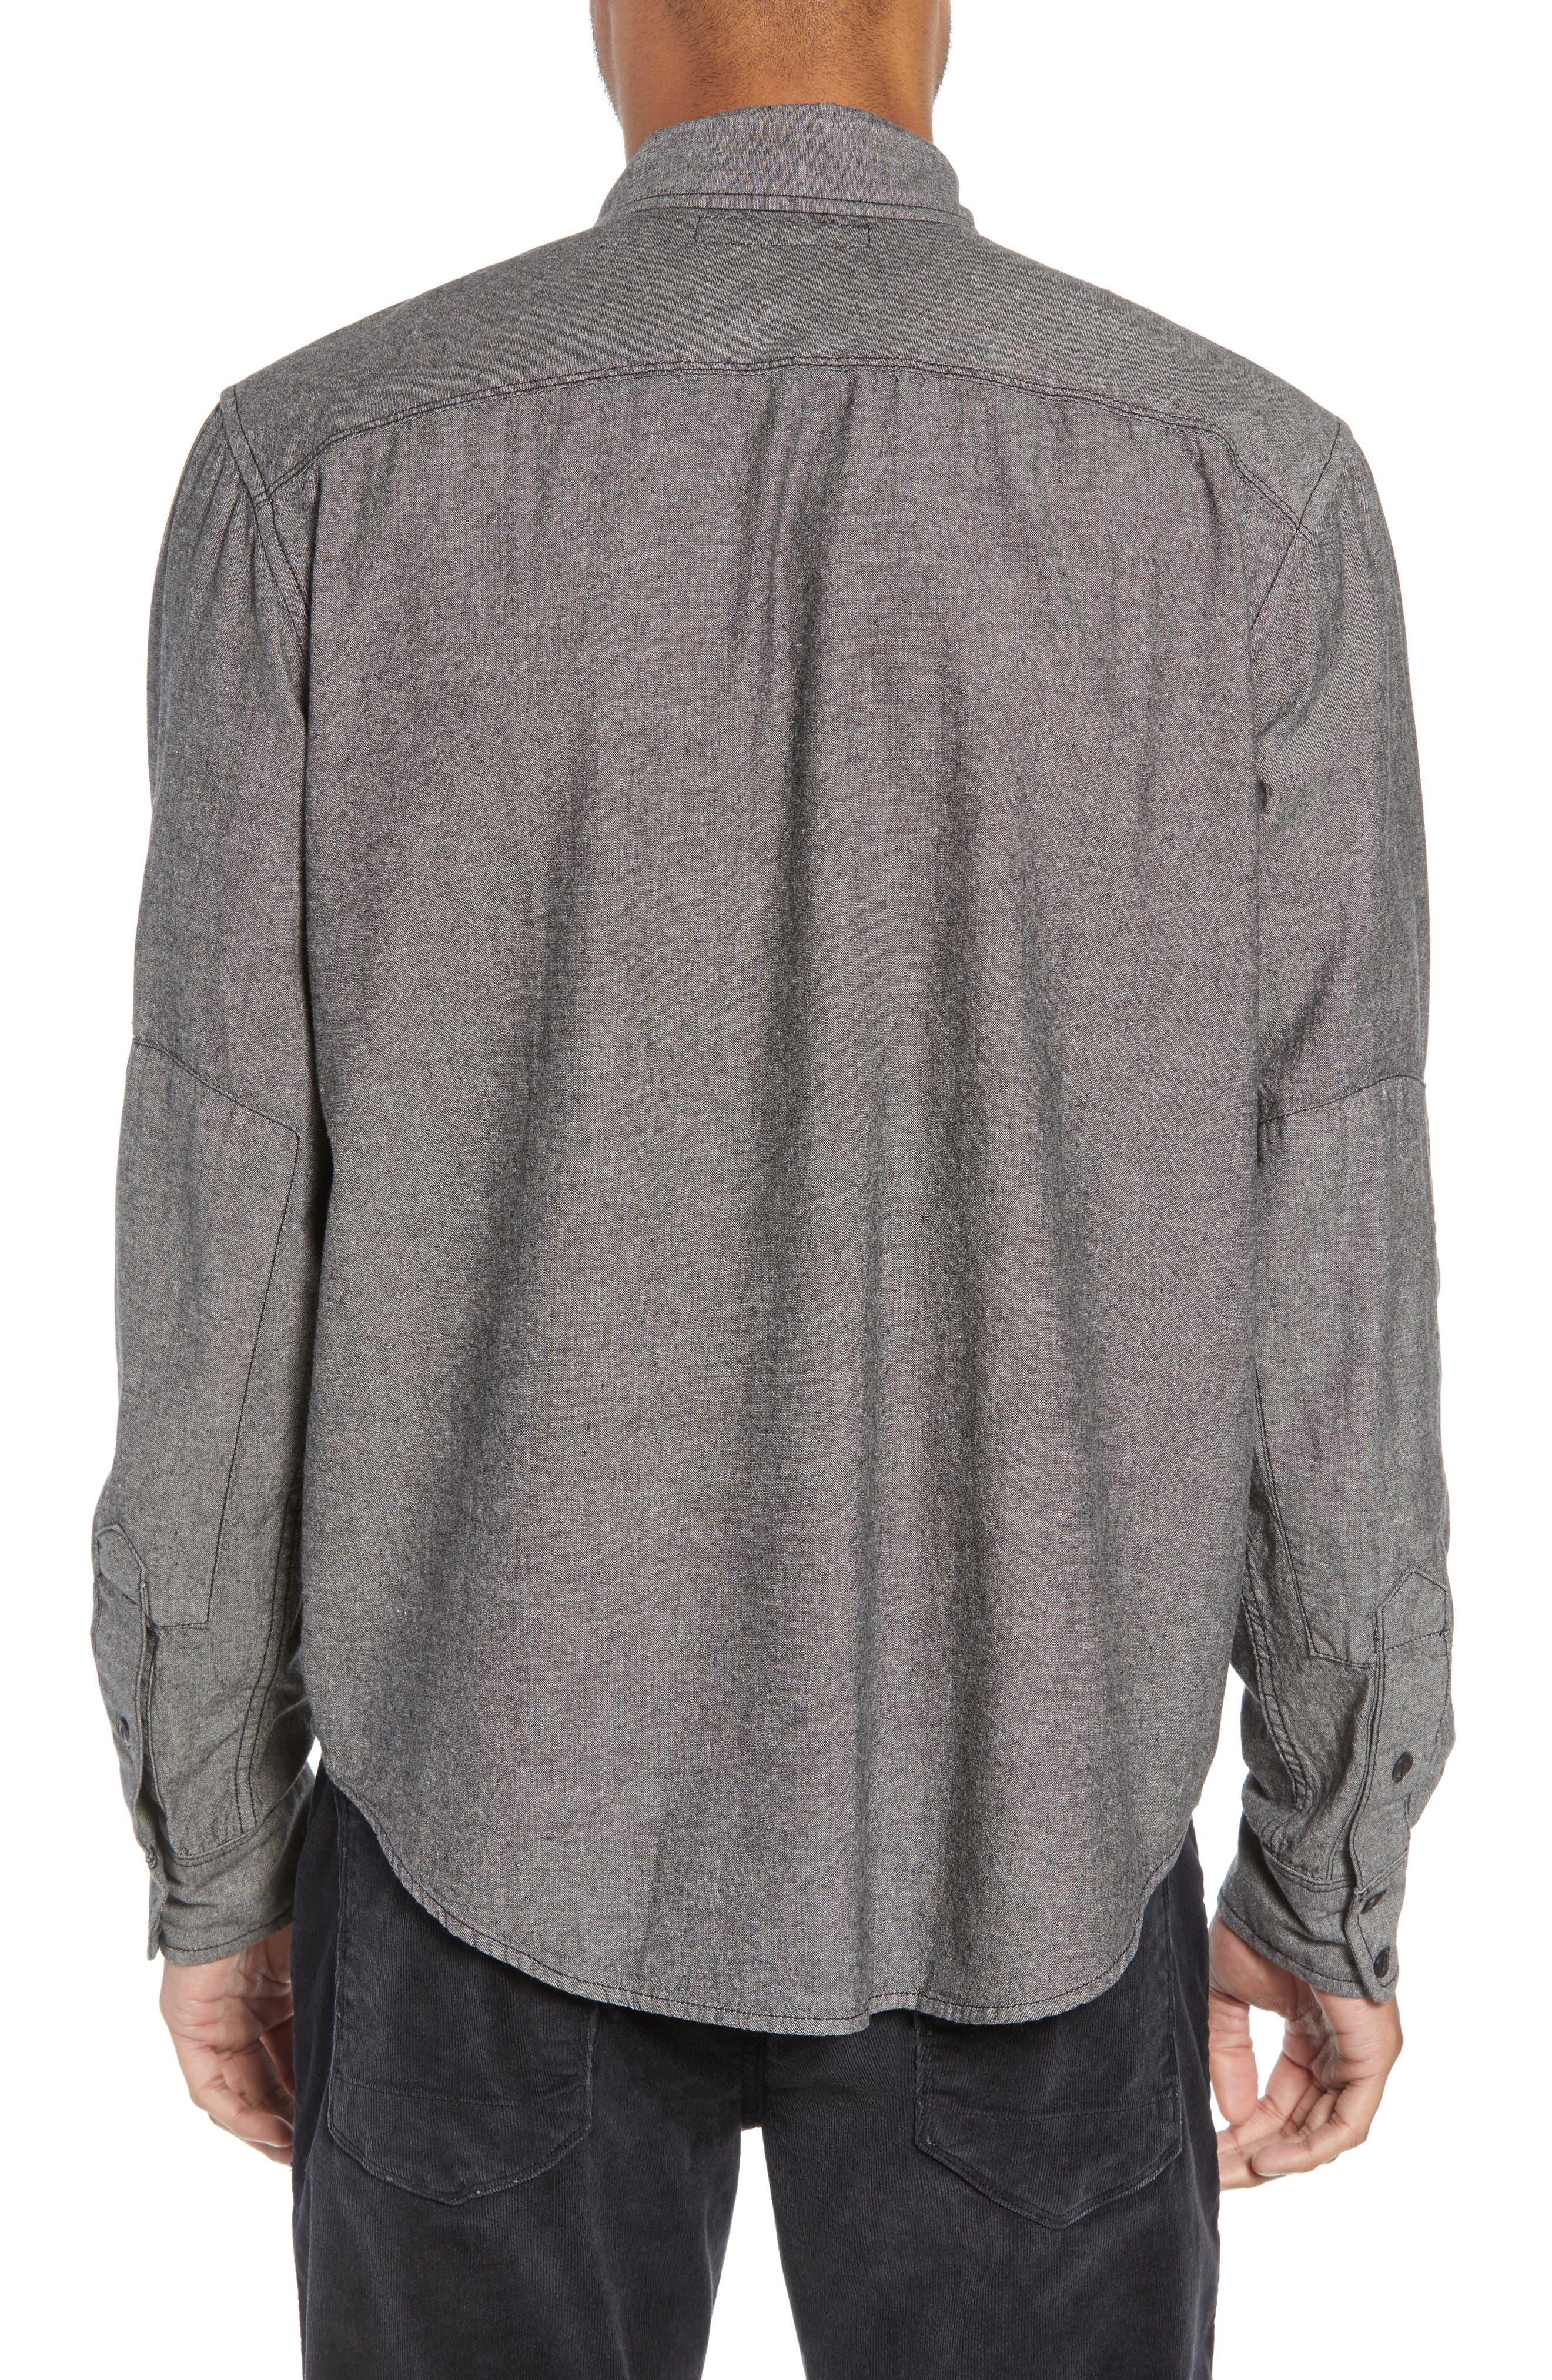 Hudson Regular Fit Chambray Sport Shirt,                             Alternate thumbnail 2, color,                             035